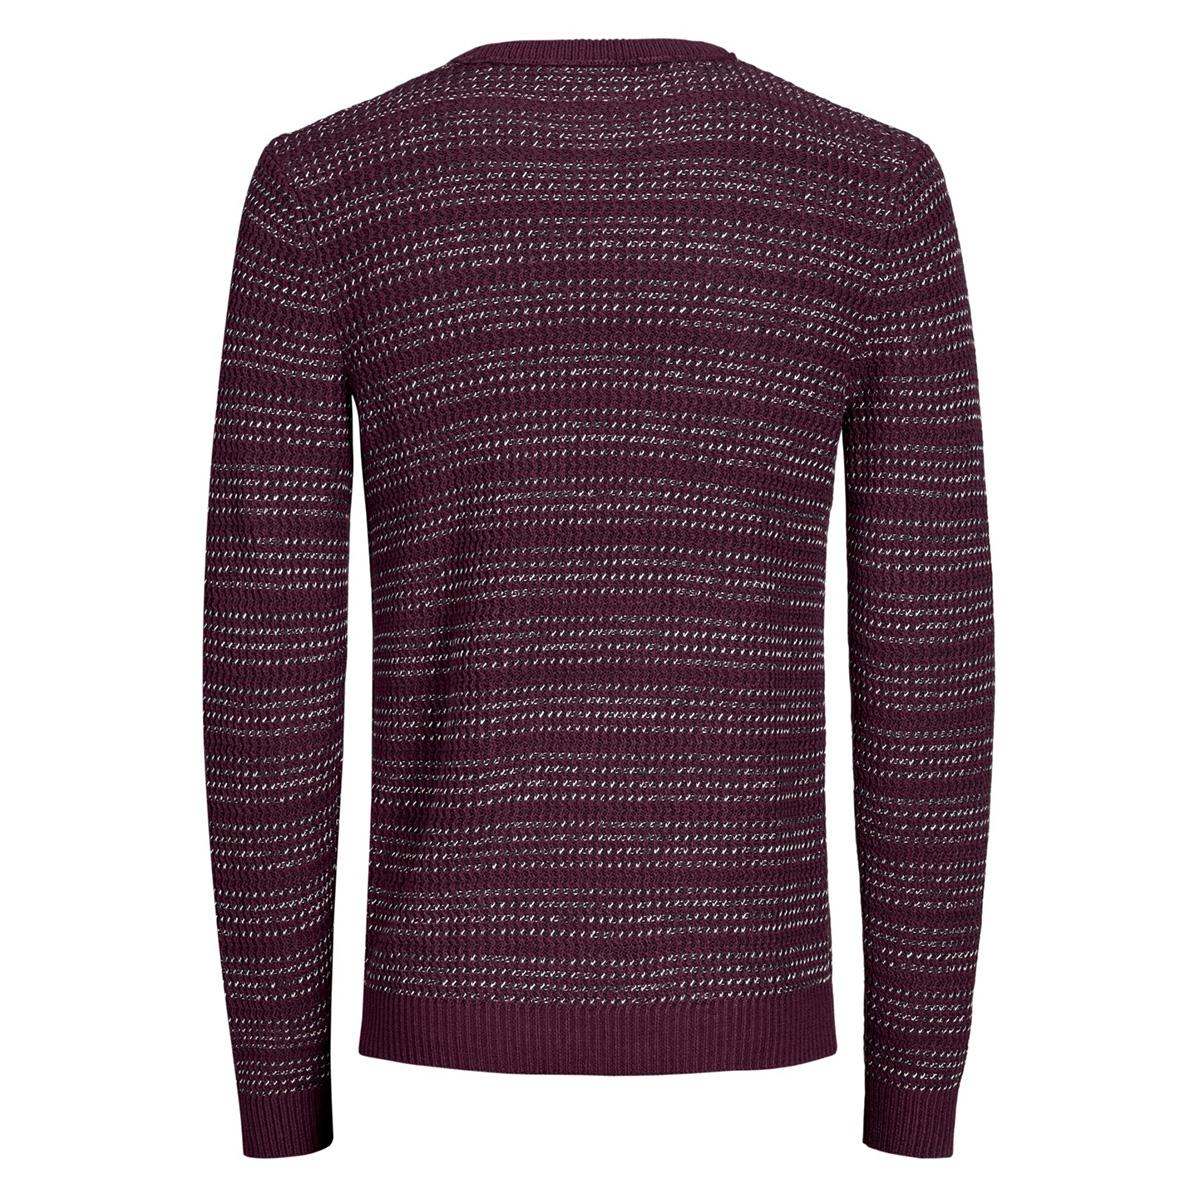 jorflow knit crew neck. 12162644 jack & jones trui port royale/stripe kni